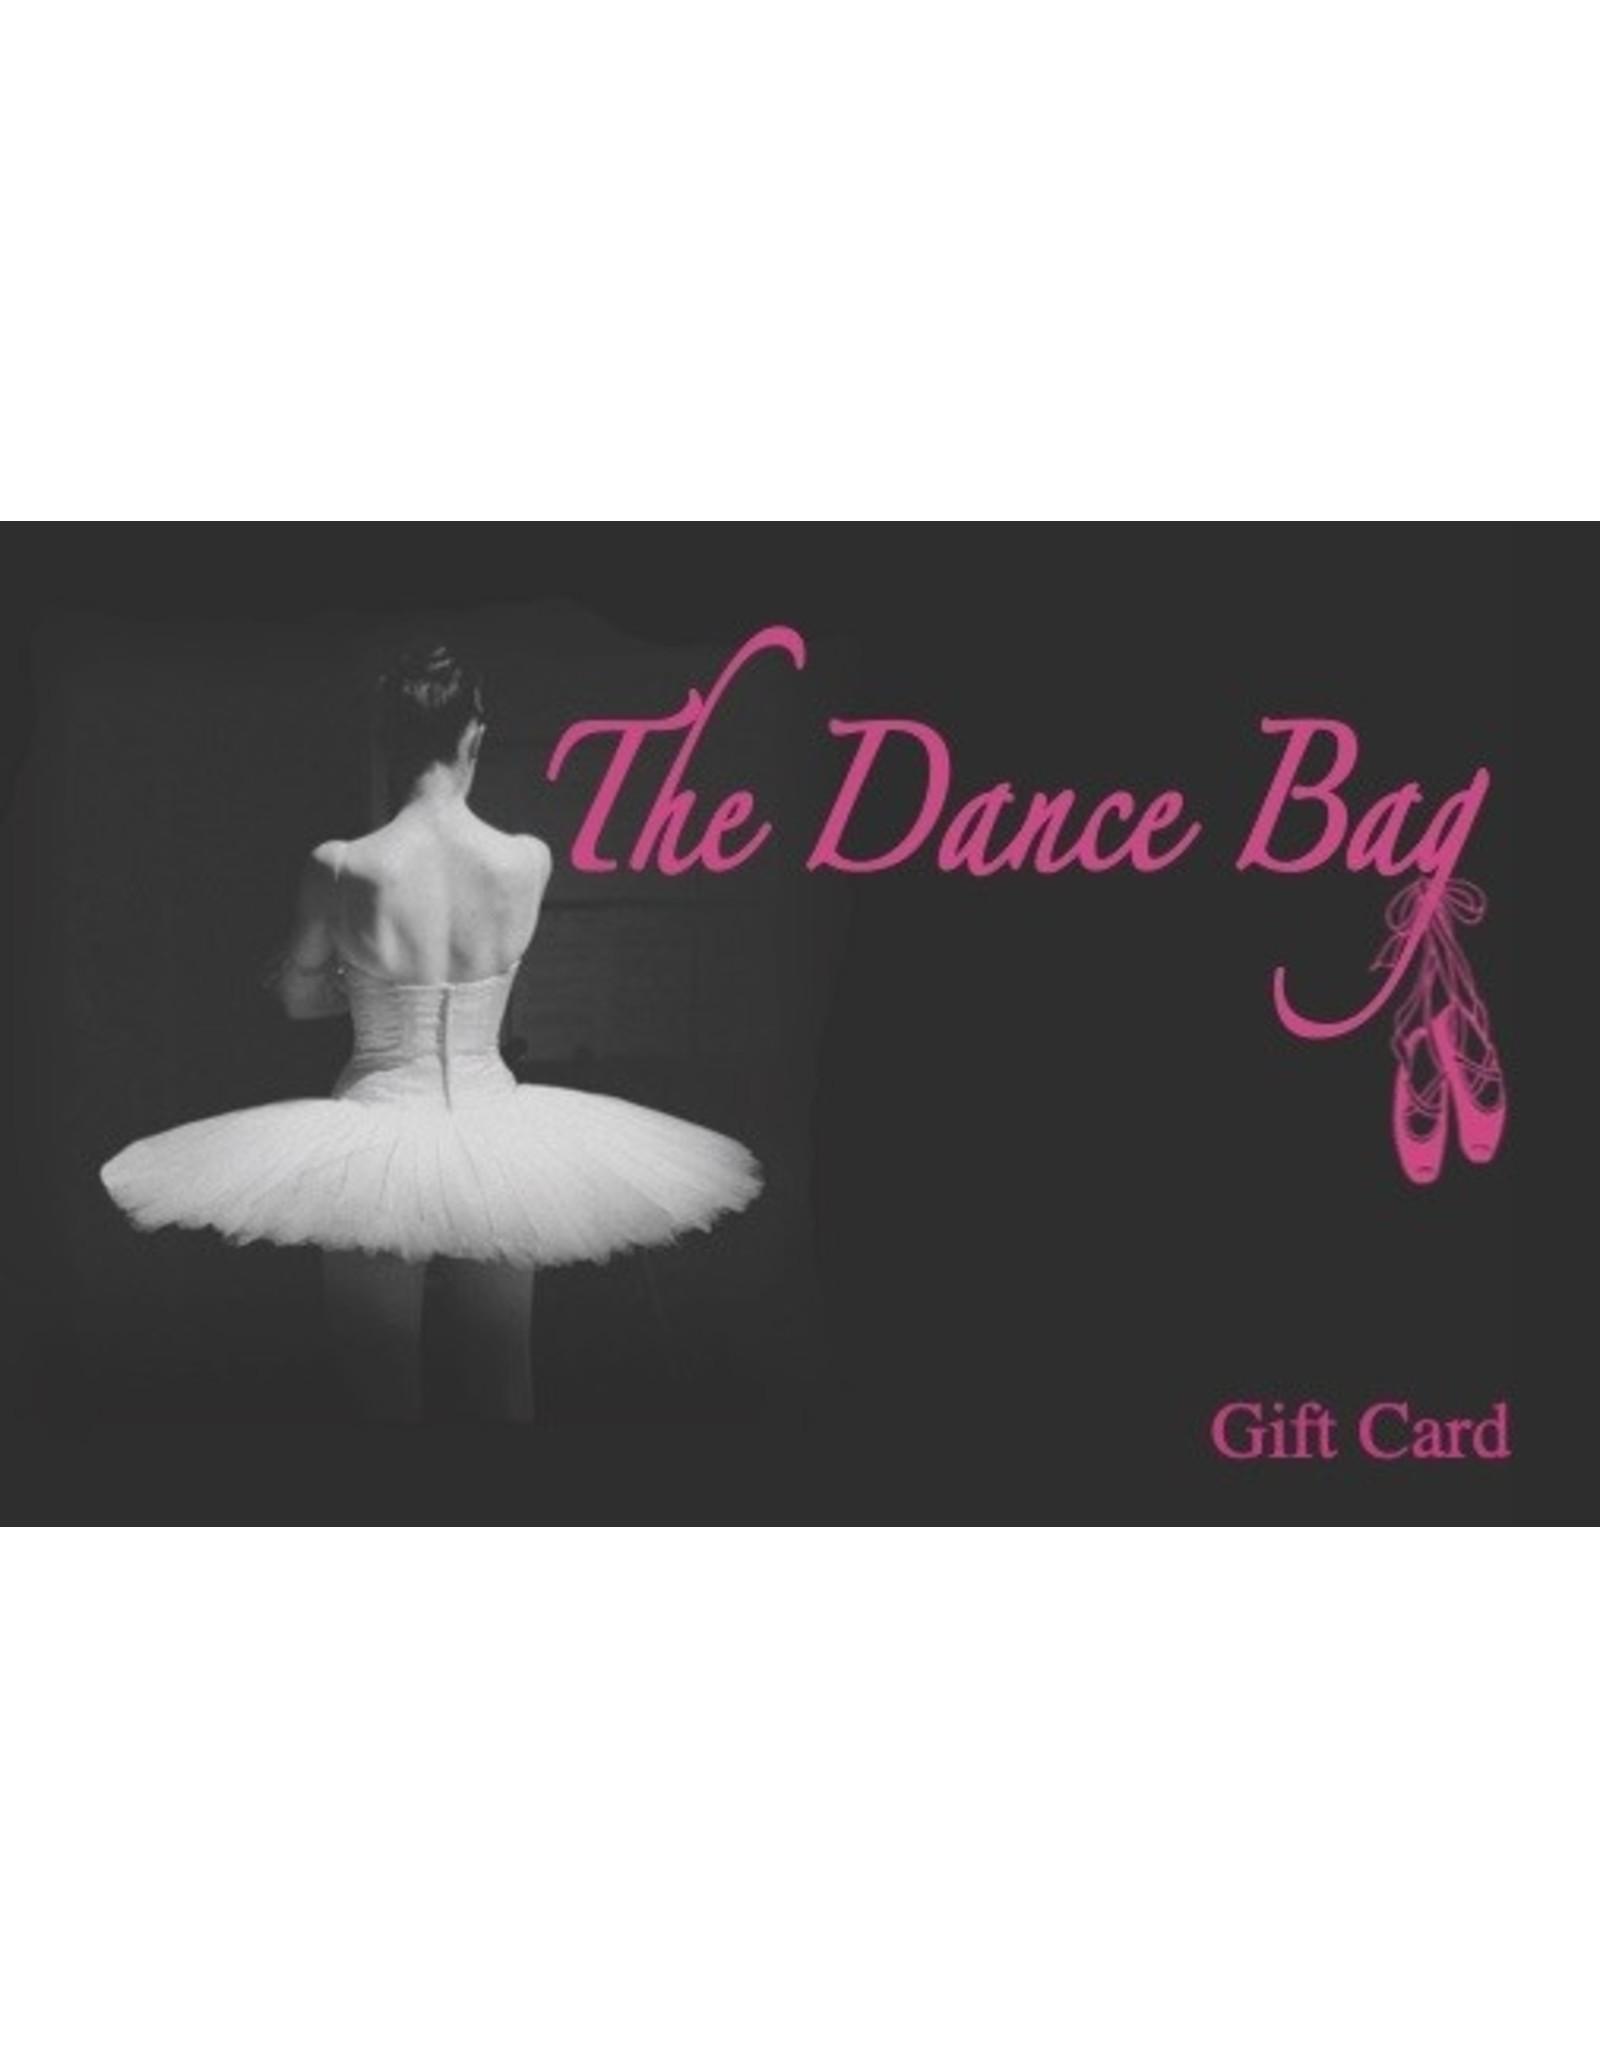 The Dance Bag Gift Card